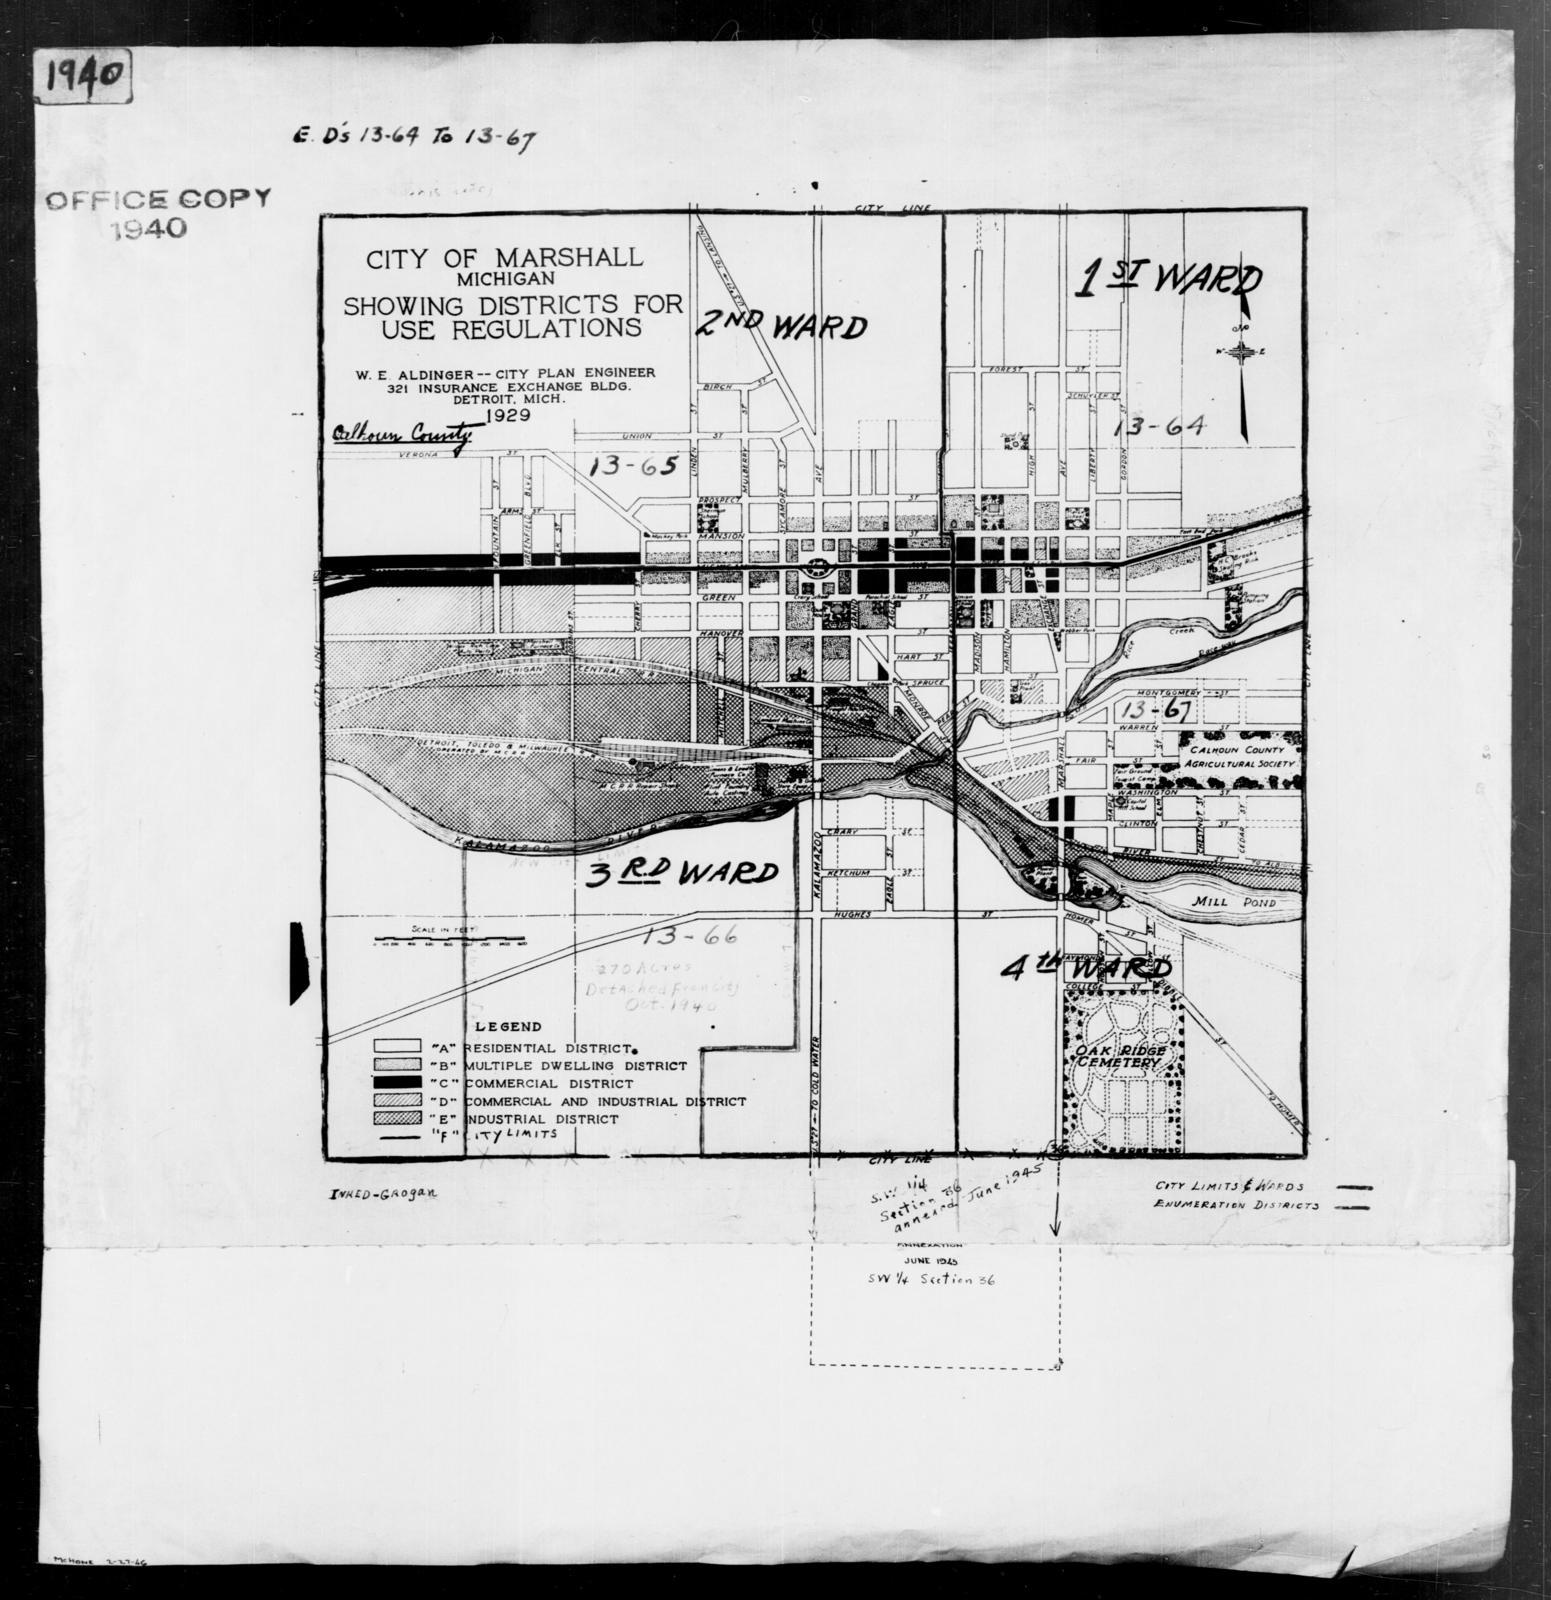 1940 Census Enumeration District Maps - Michigan - Calhoun